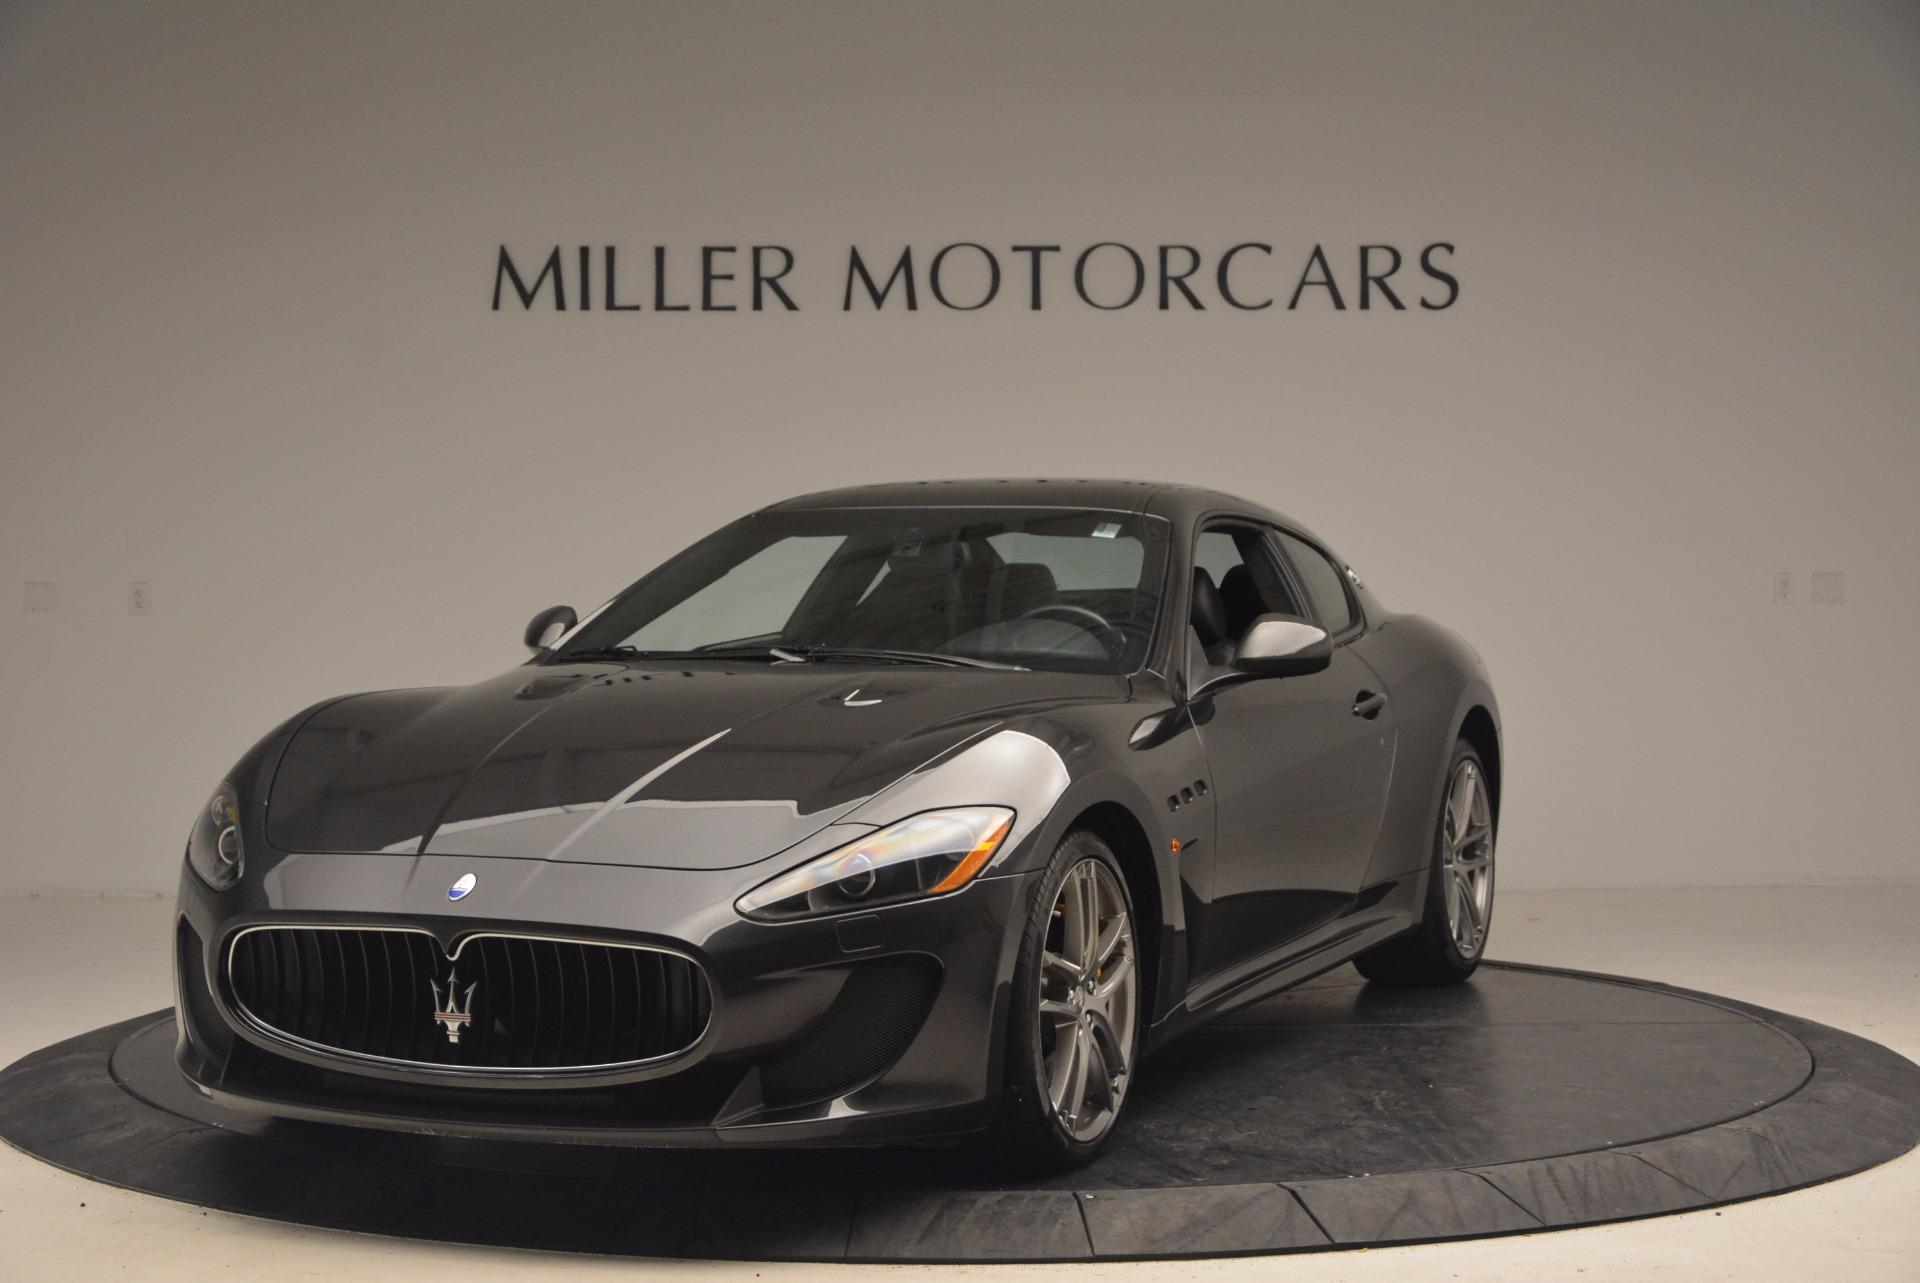 Used 2012 Maserati GranTurismo MC for sale Sold at Bentley Greenwich in Greenwich CT 06830 1